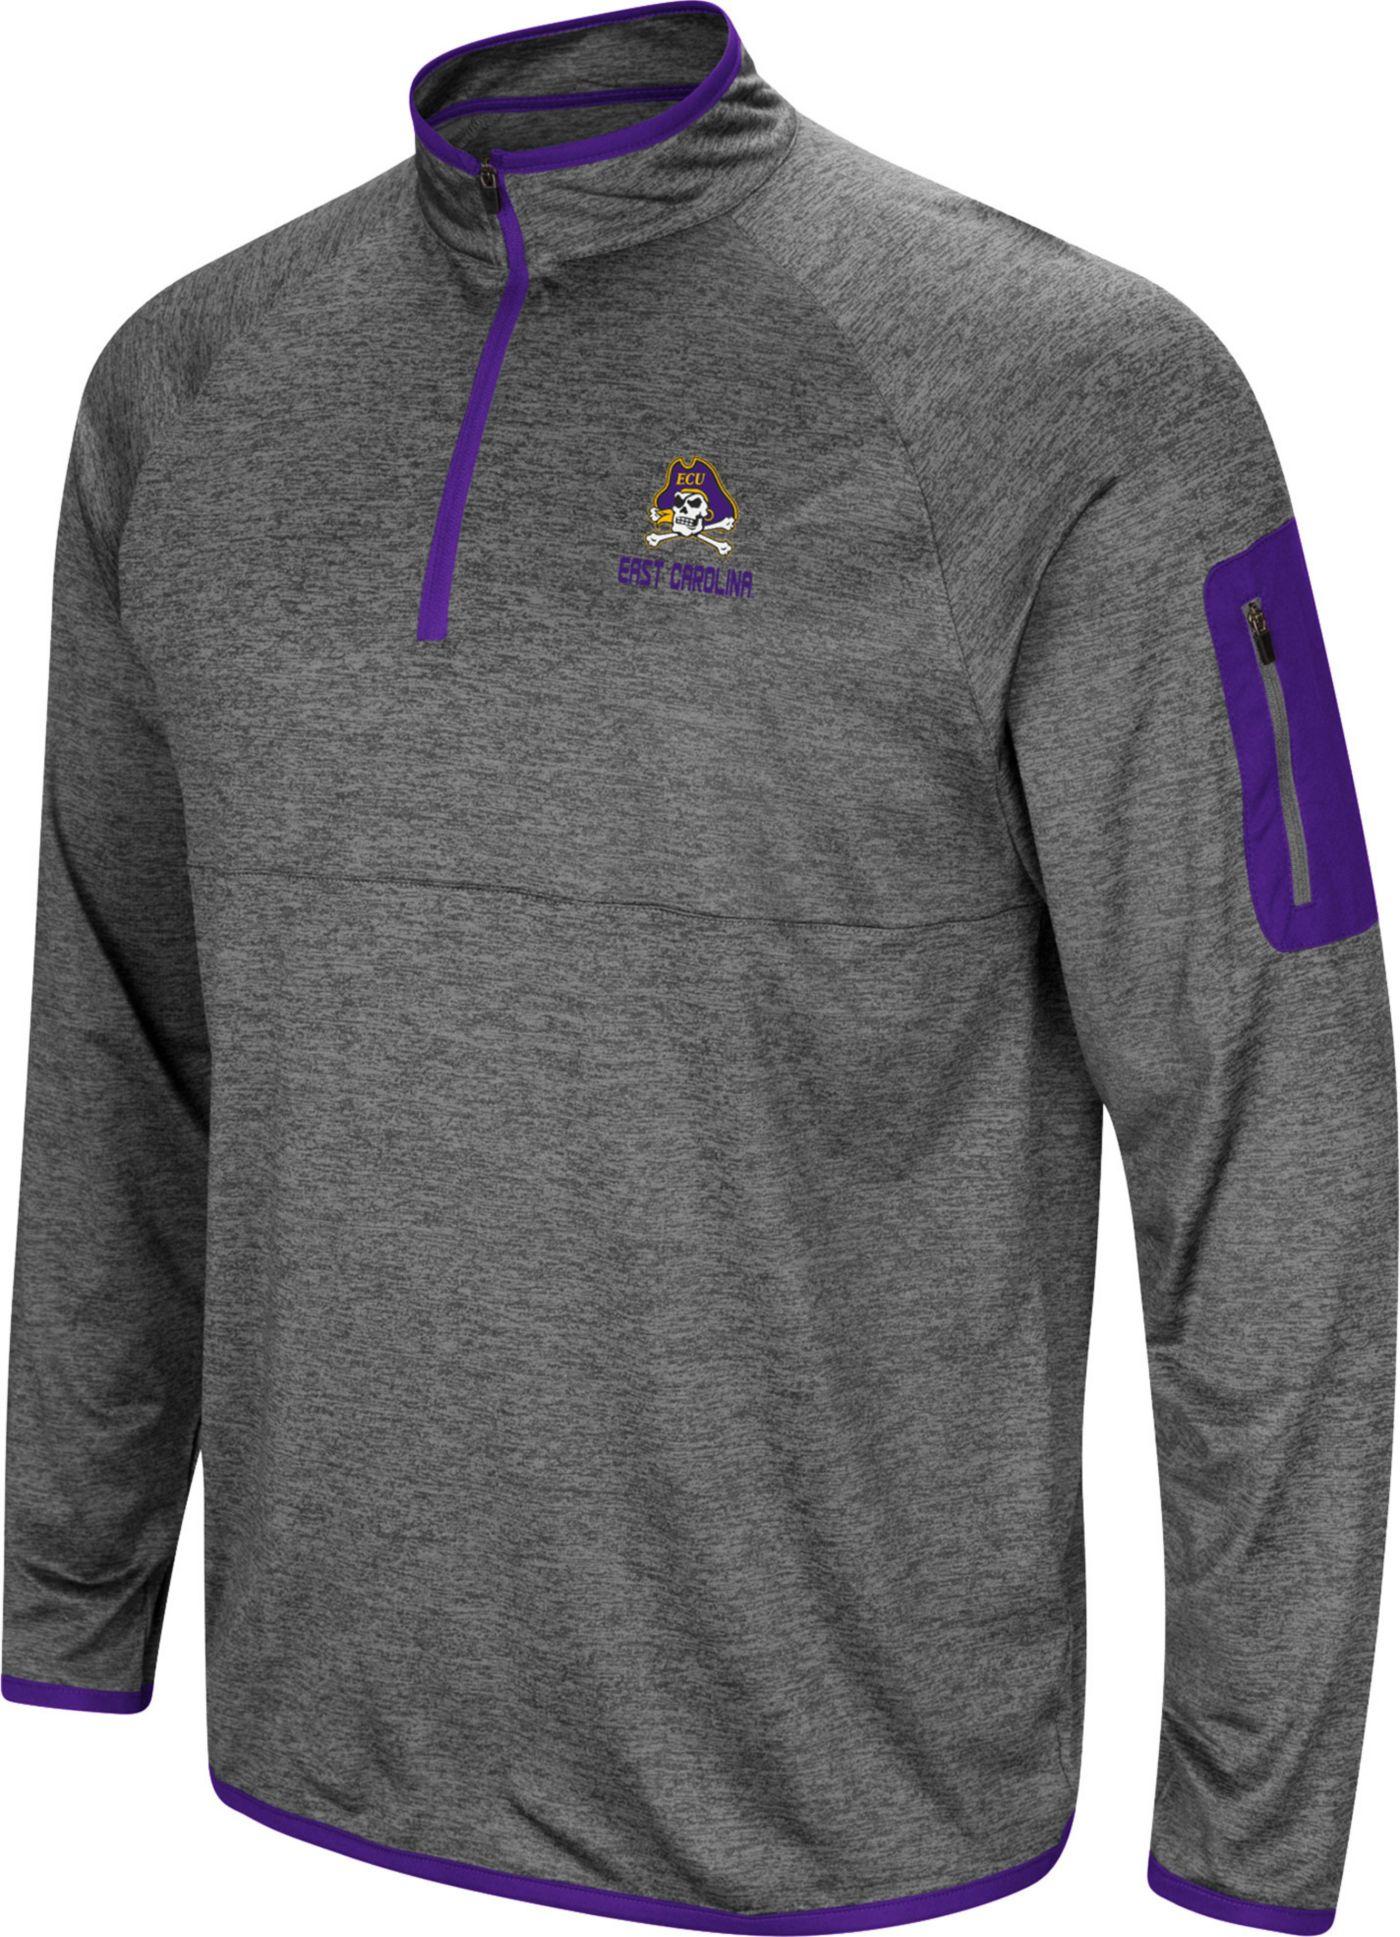 Colosseum Men's East Carolina Pirates Grey Indus River Quarter-Zip Shirt